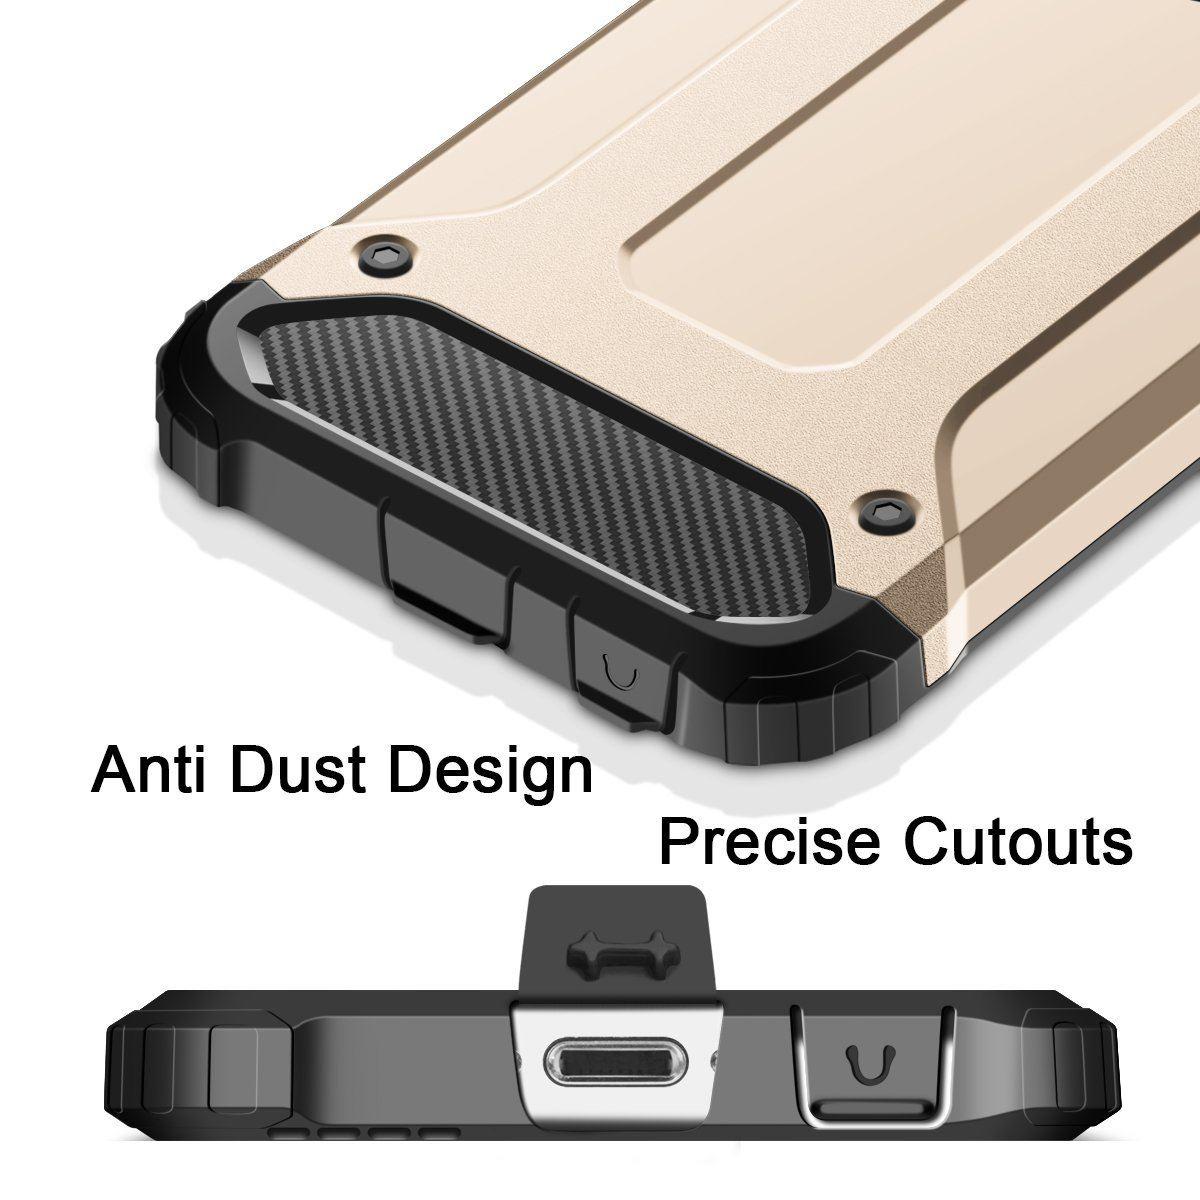 thumbnail 17 - For Apple iPhone 11 Pro Max XR Xs X 8 7 Plus 6 5 Se Case Cover Tough Armor